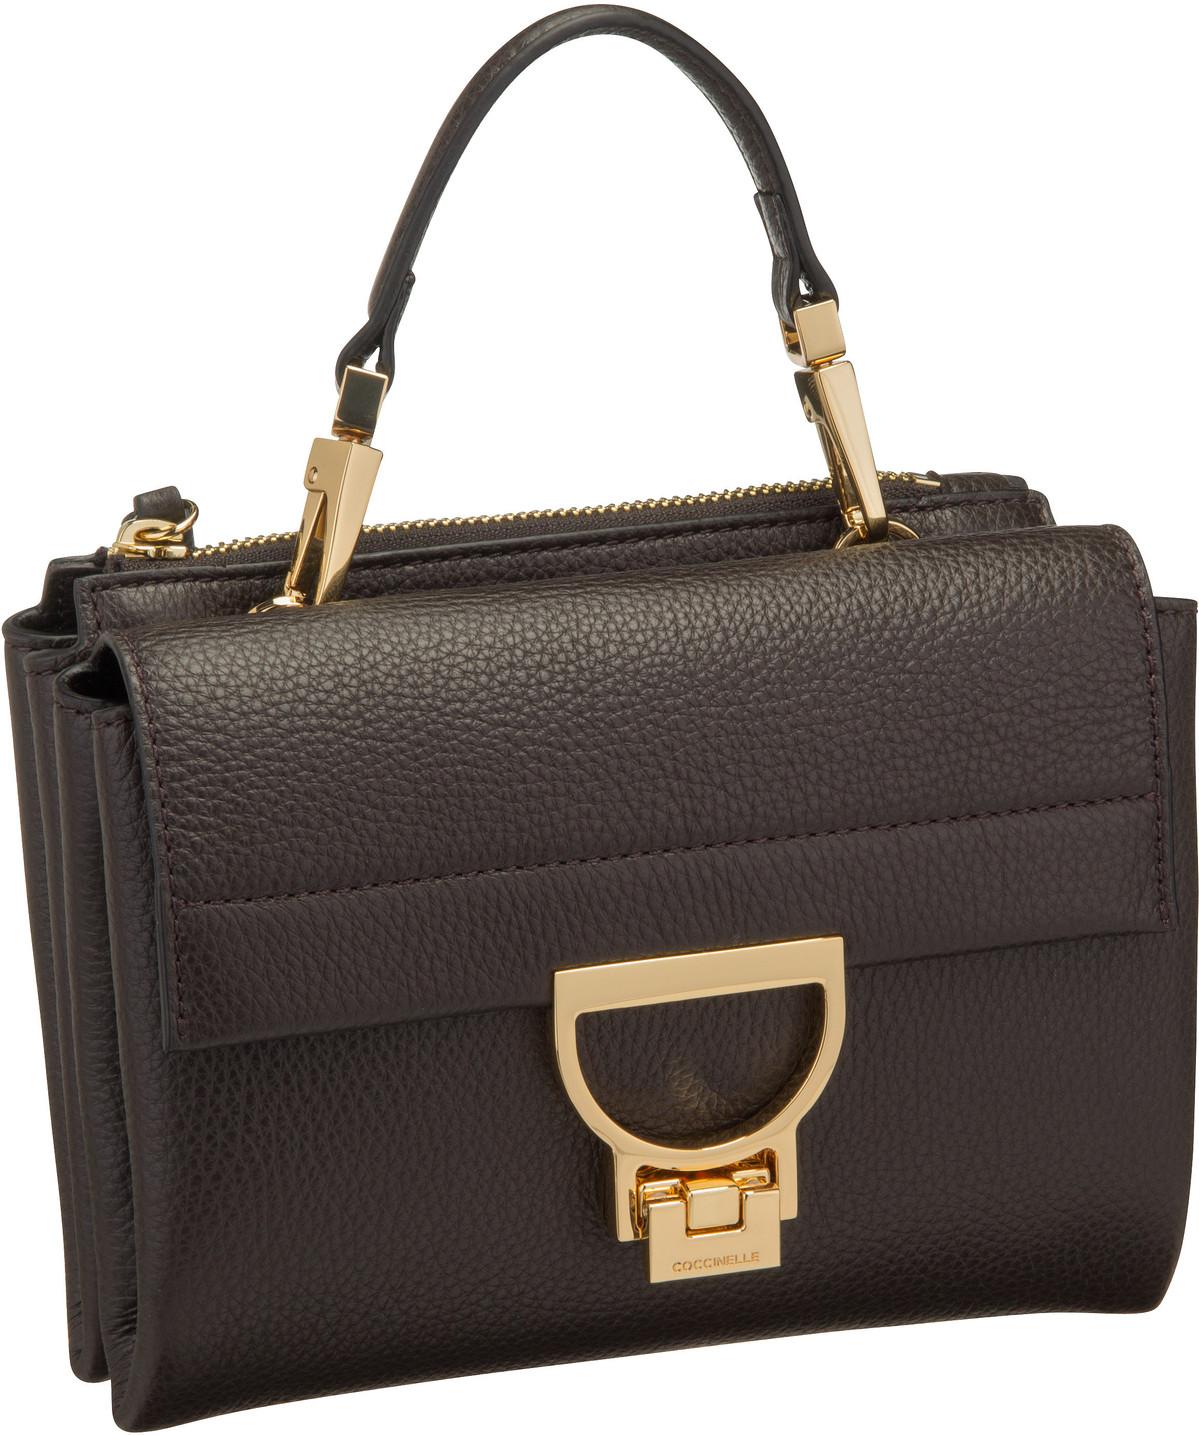 Handtasche Arlettis 55B7 T.Moro